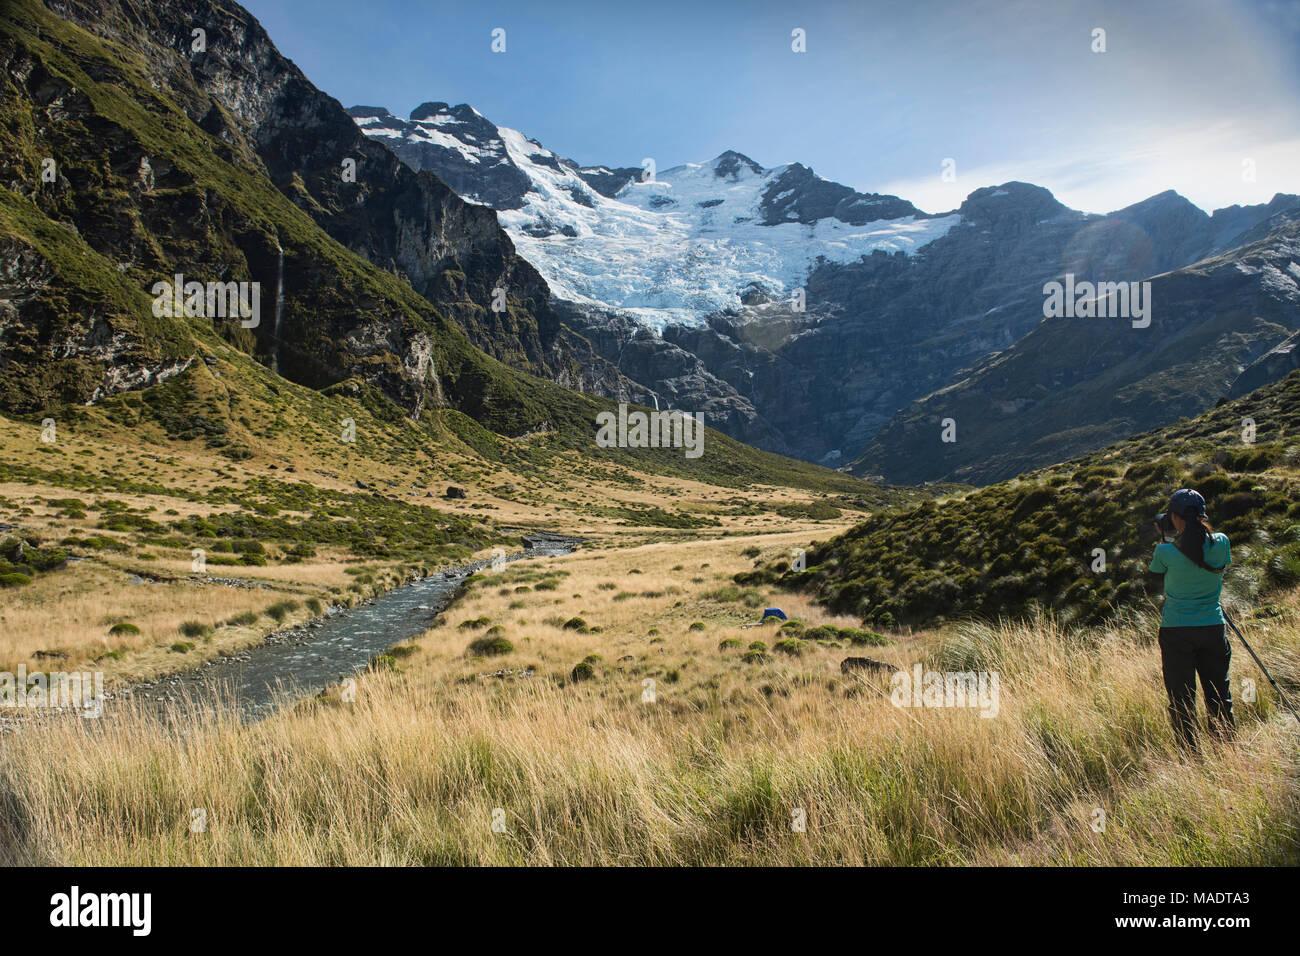 Favoloso paesaggio sotto Mt. Earnslaw (Pikirakatahi), posizione per The Hobbit film Glenorchy, Nuova Zelanda Immagini Stock